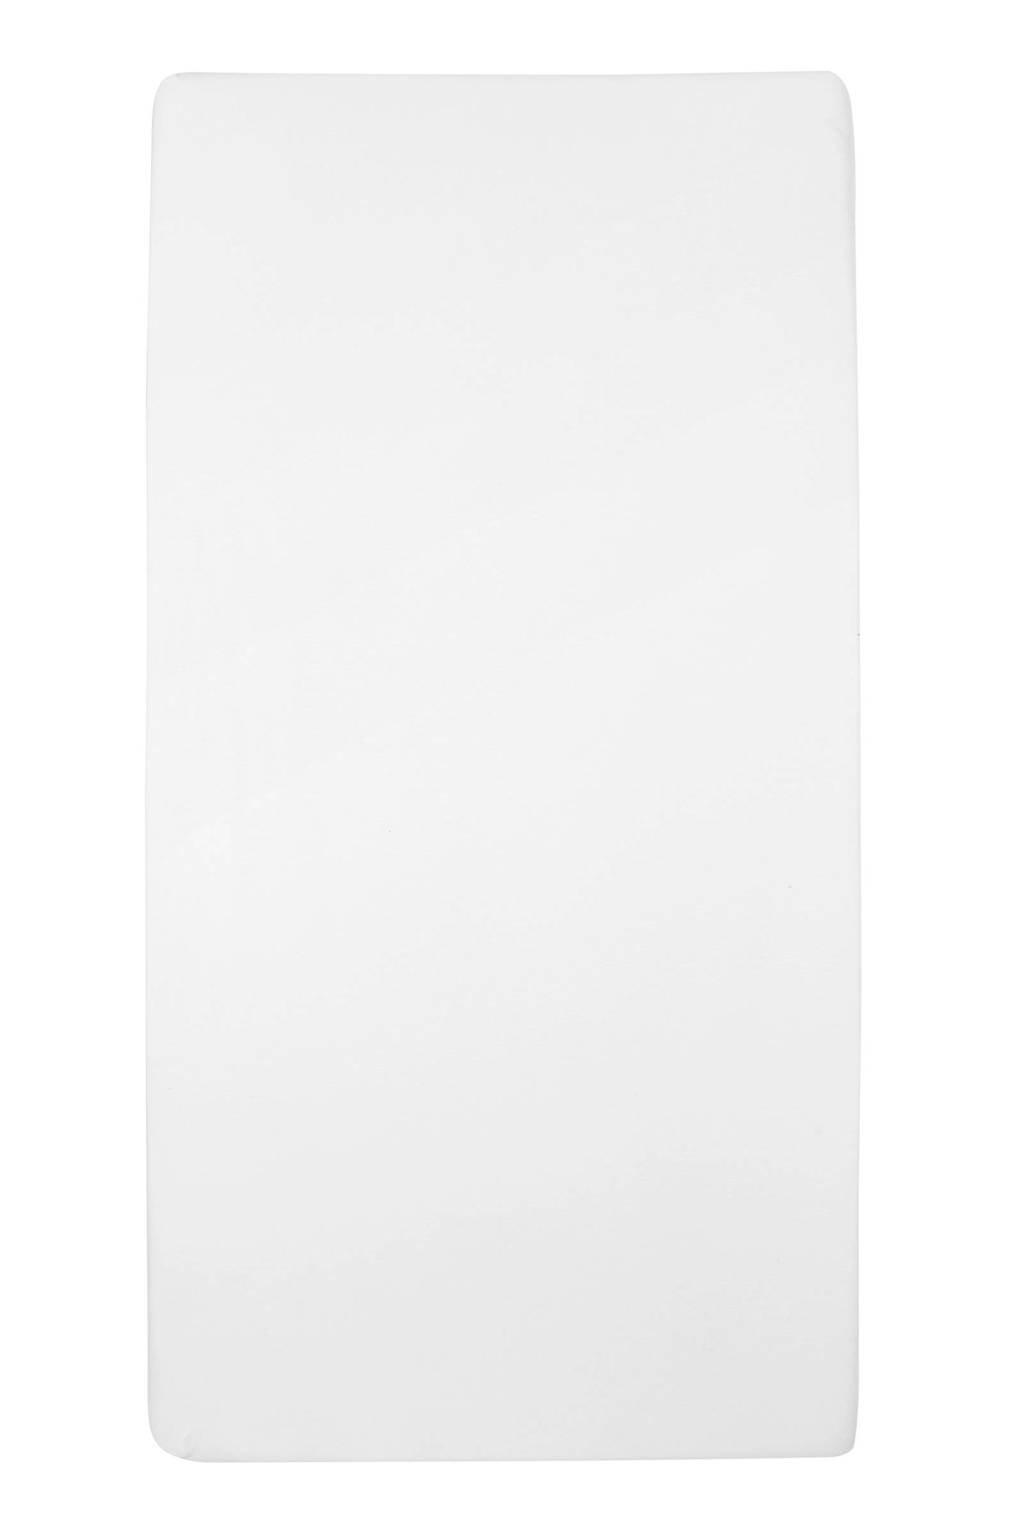 Meyco jersey baby hoeslaken ledikant 60x120 cm Wit